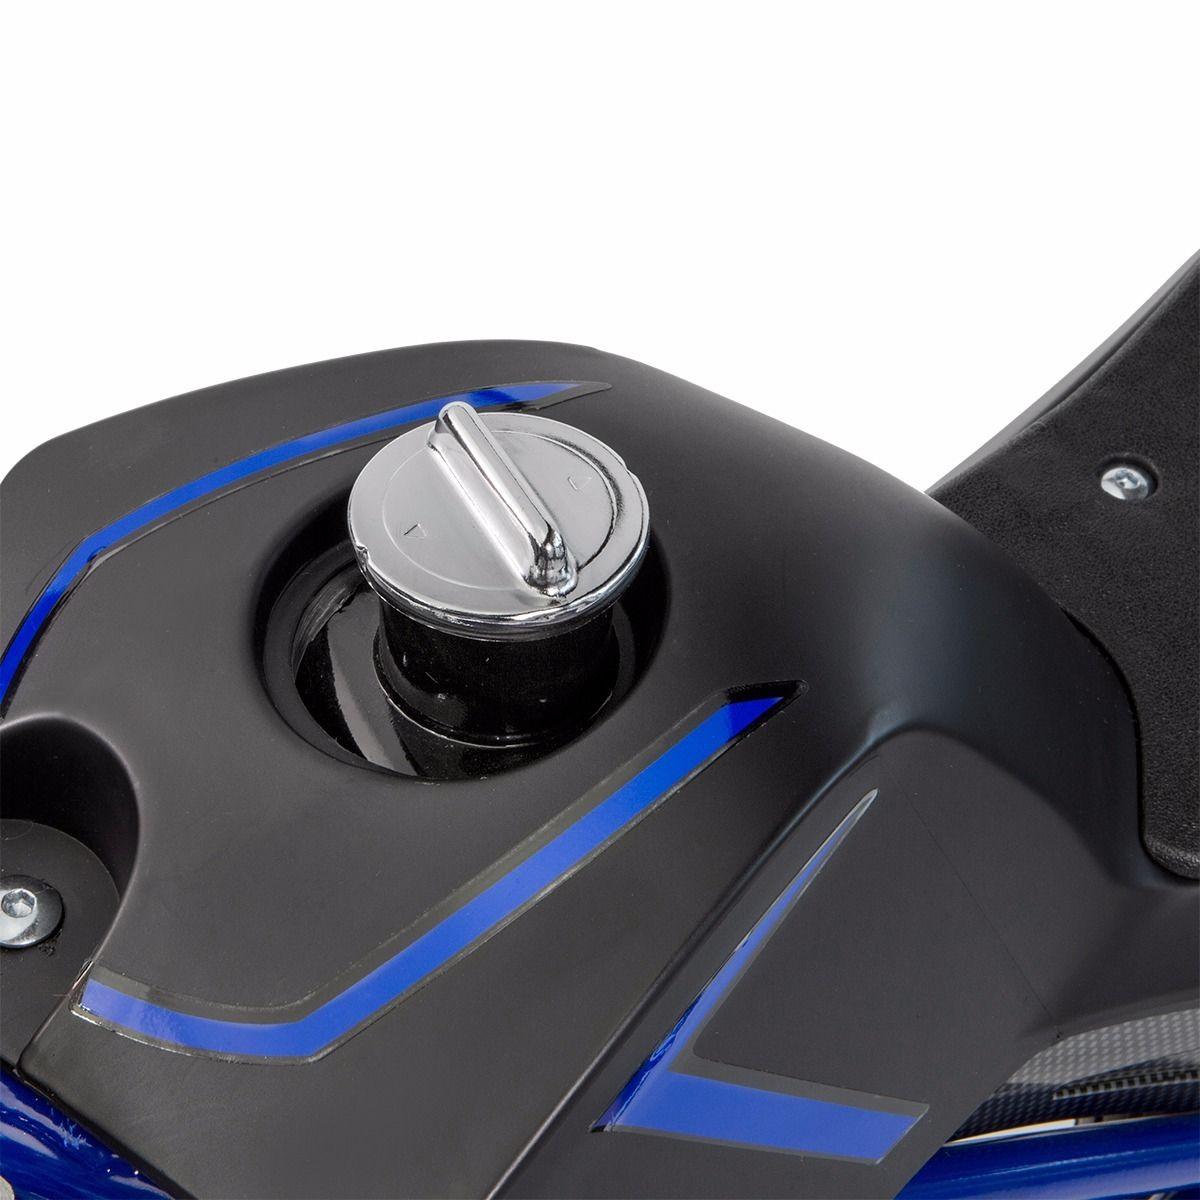 XtremepowerUS-Gas-Pocket-Bike-Motor-Bike-Scooter-40cc-Epa-Engine-Motorcycle thumbnail 11